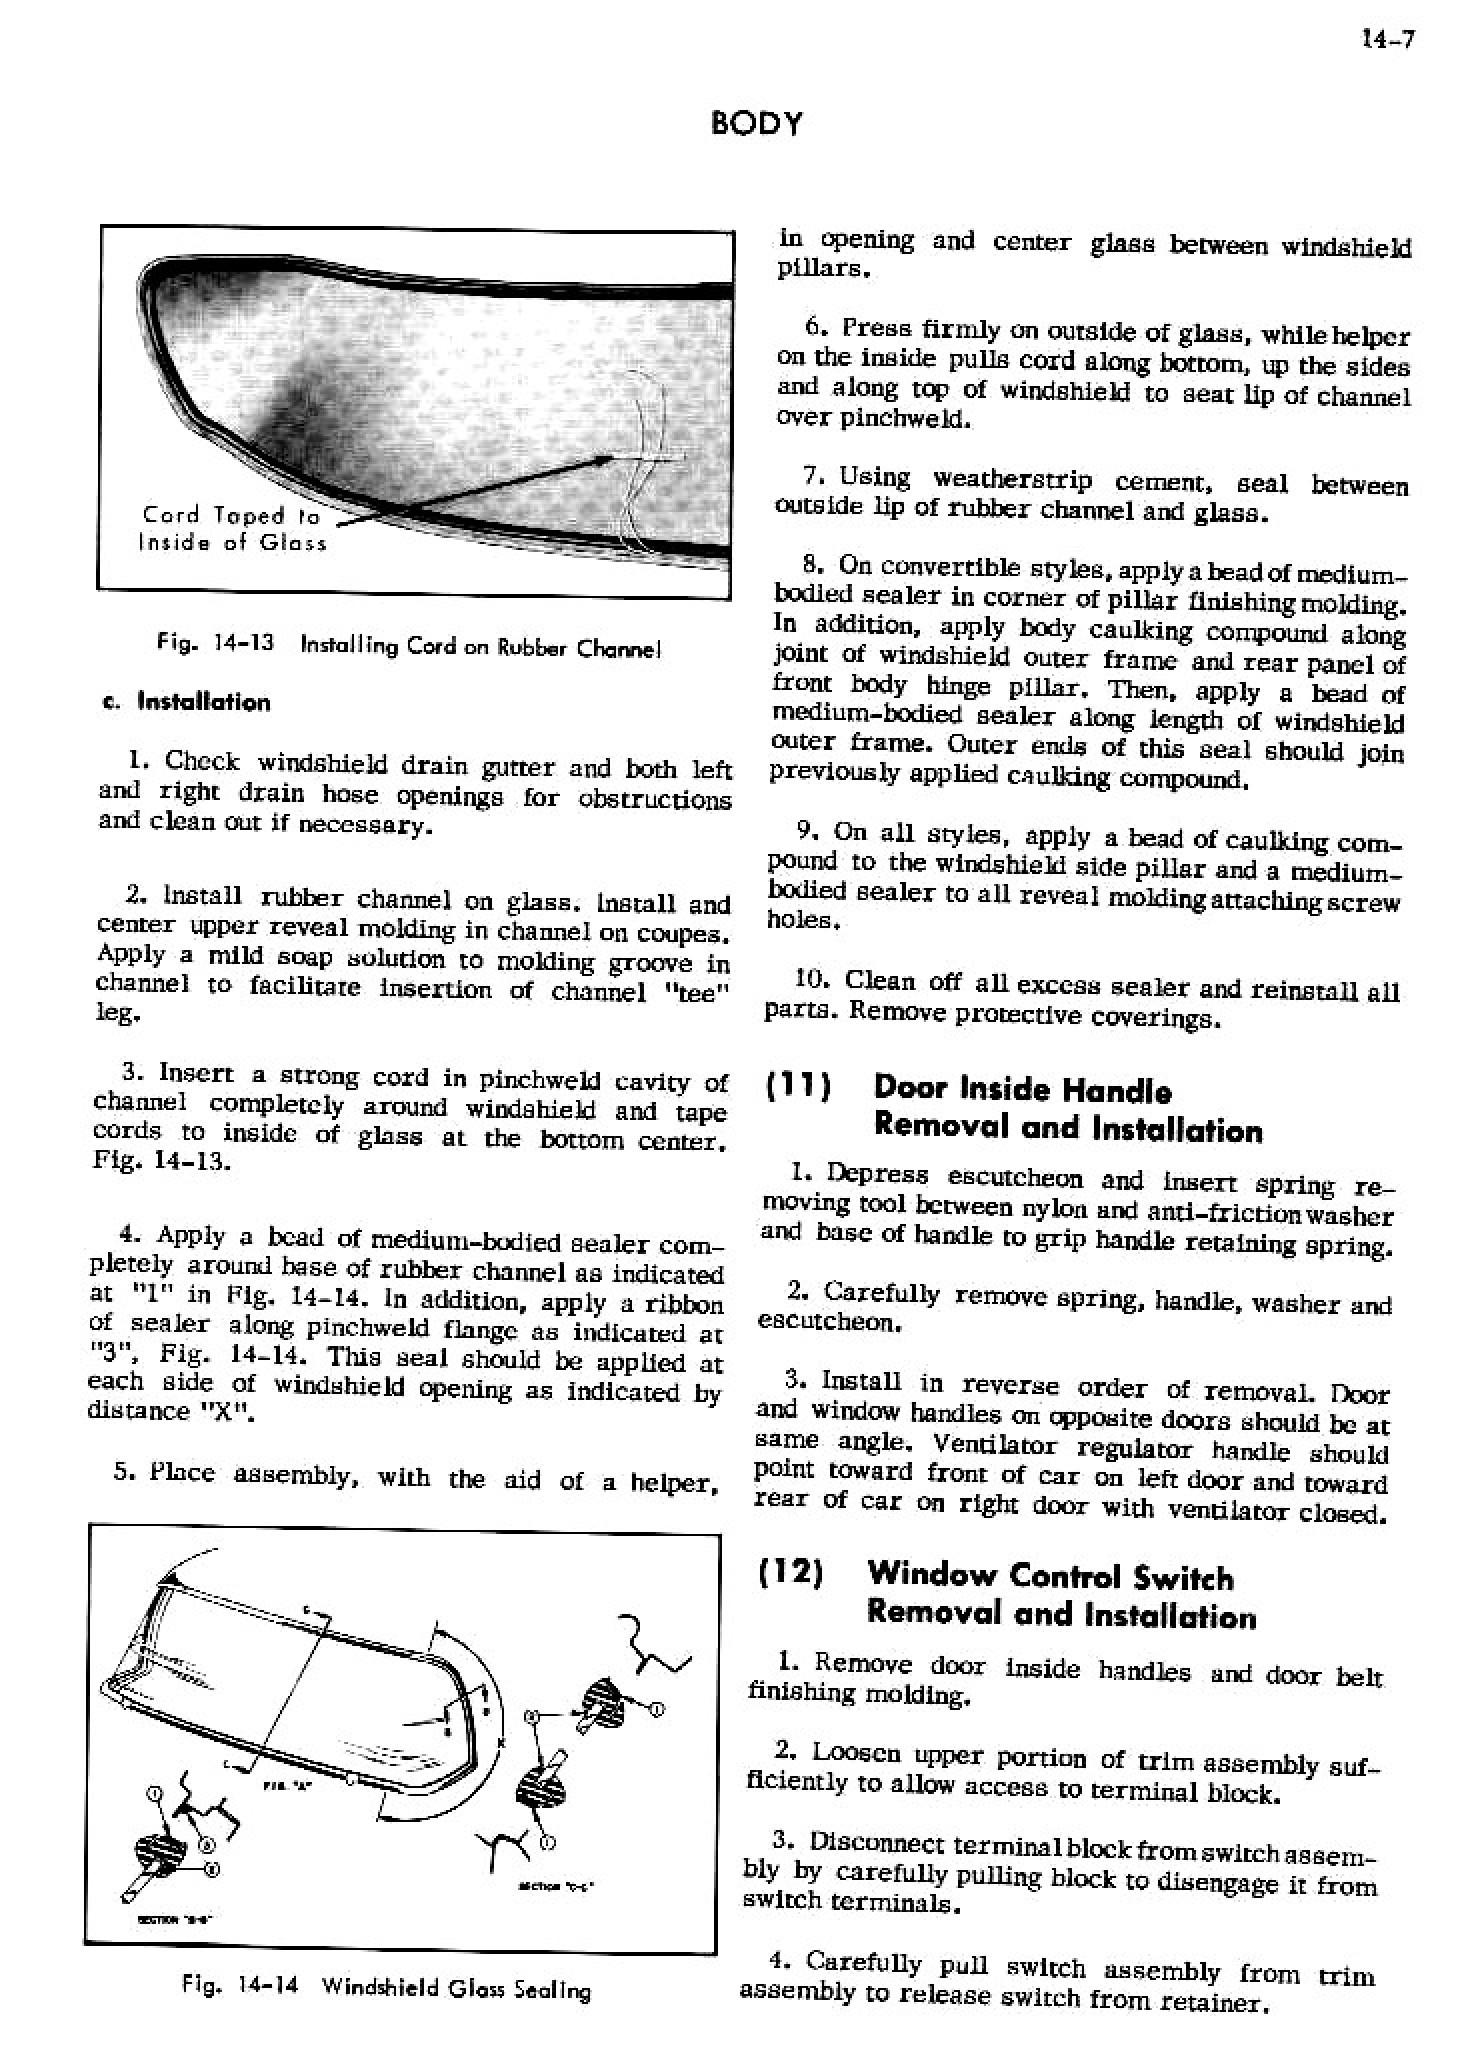 1956 Cadillac Shop Manual- Body Page 7 of 87